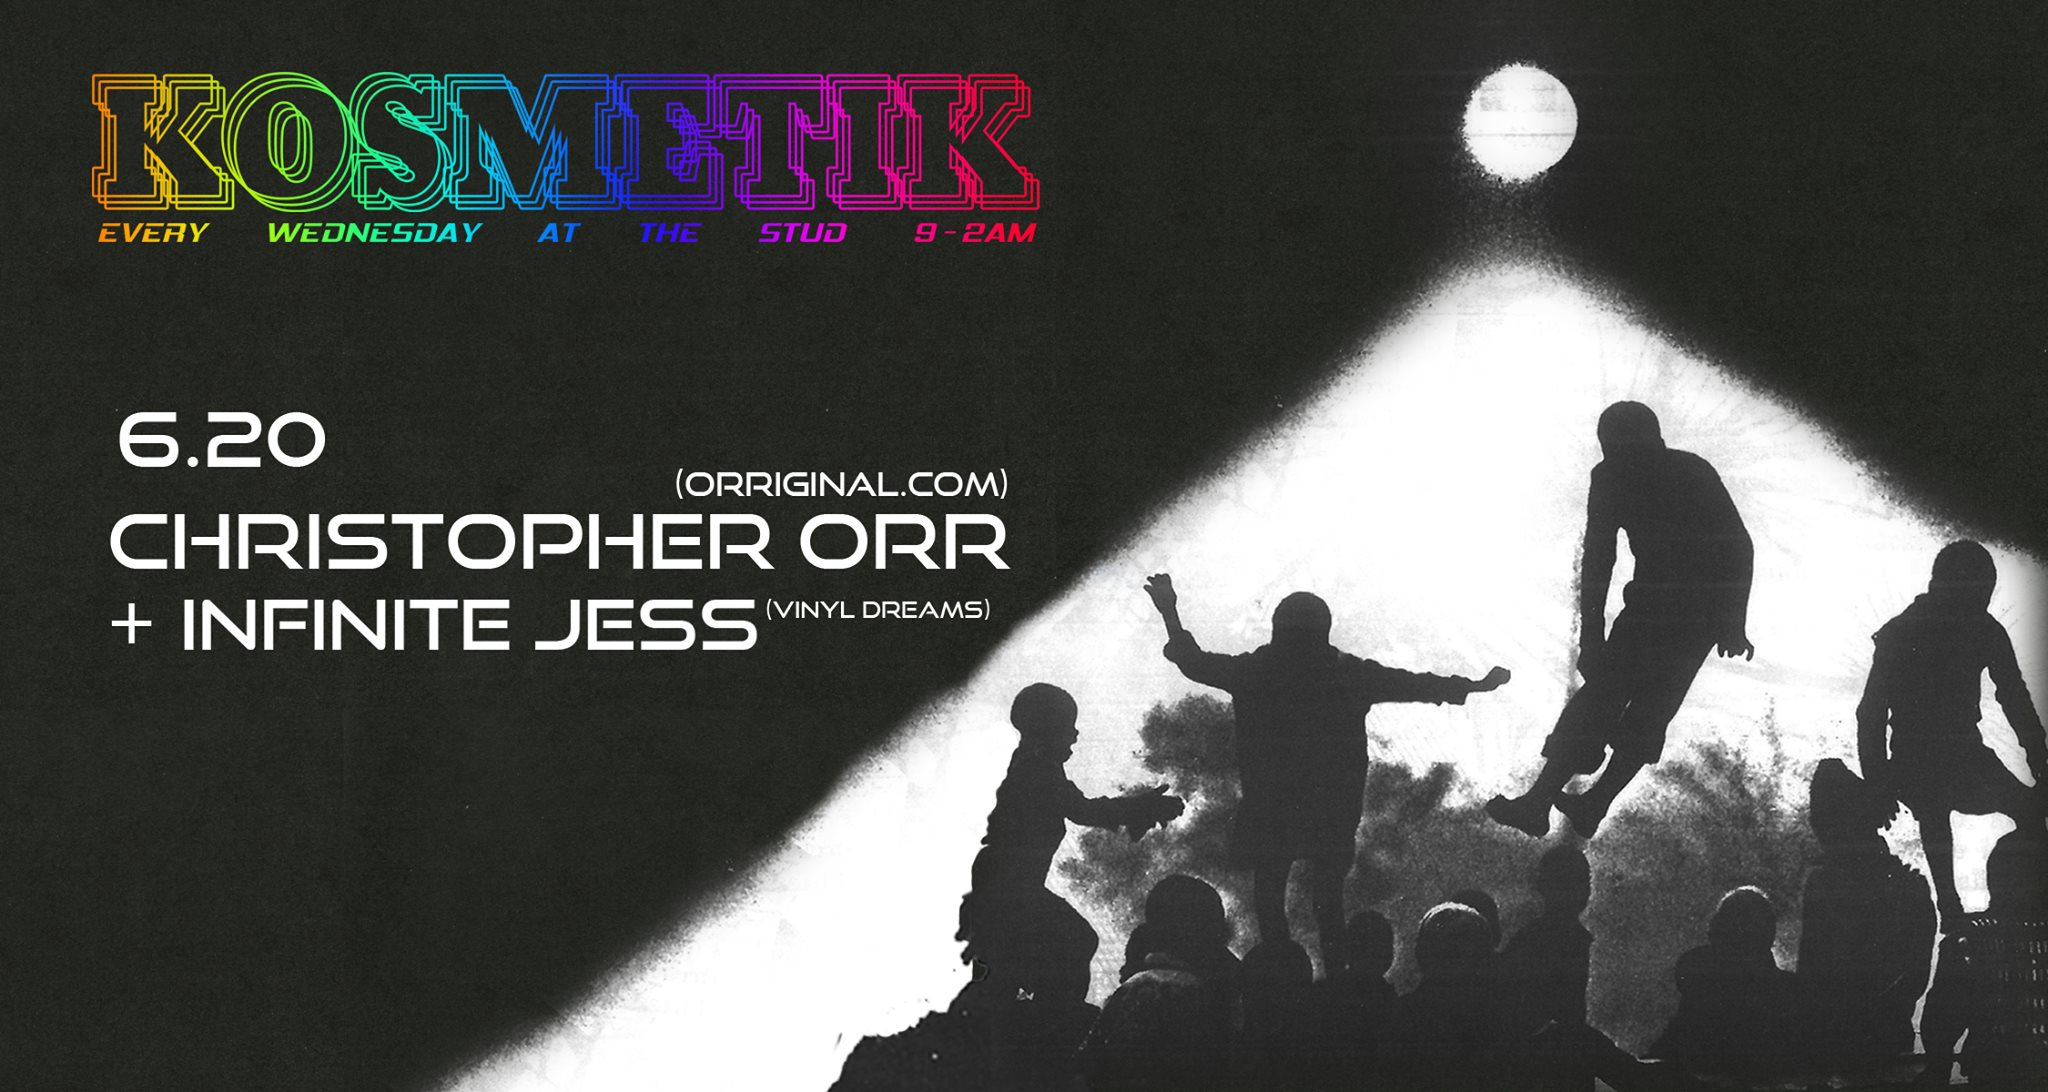 Kosmetik Pride w/ Infinite Jess & Christopher Orr